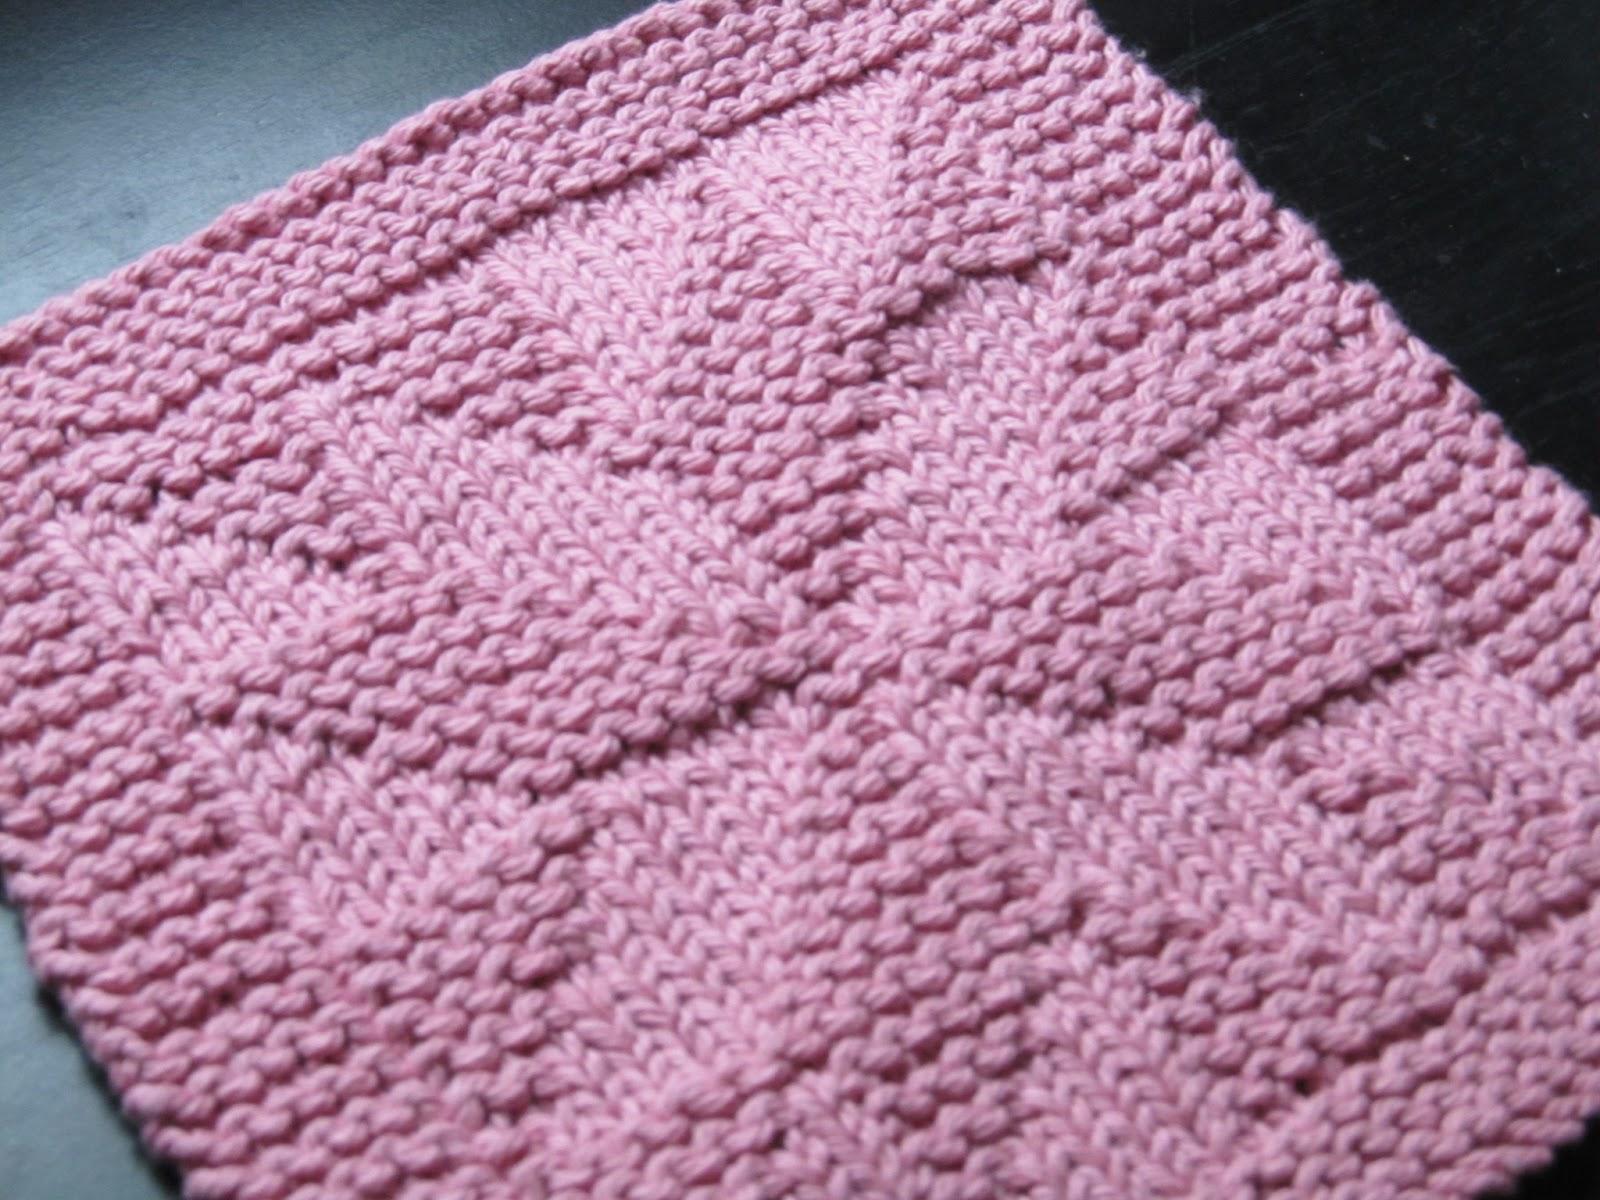 Knitting Styles Patterns : New knitting styles and tricks of washcloth paterns diy